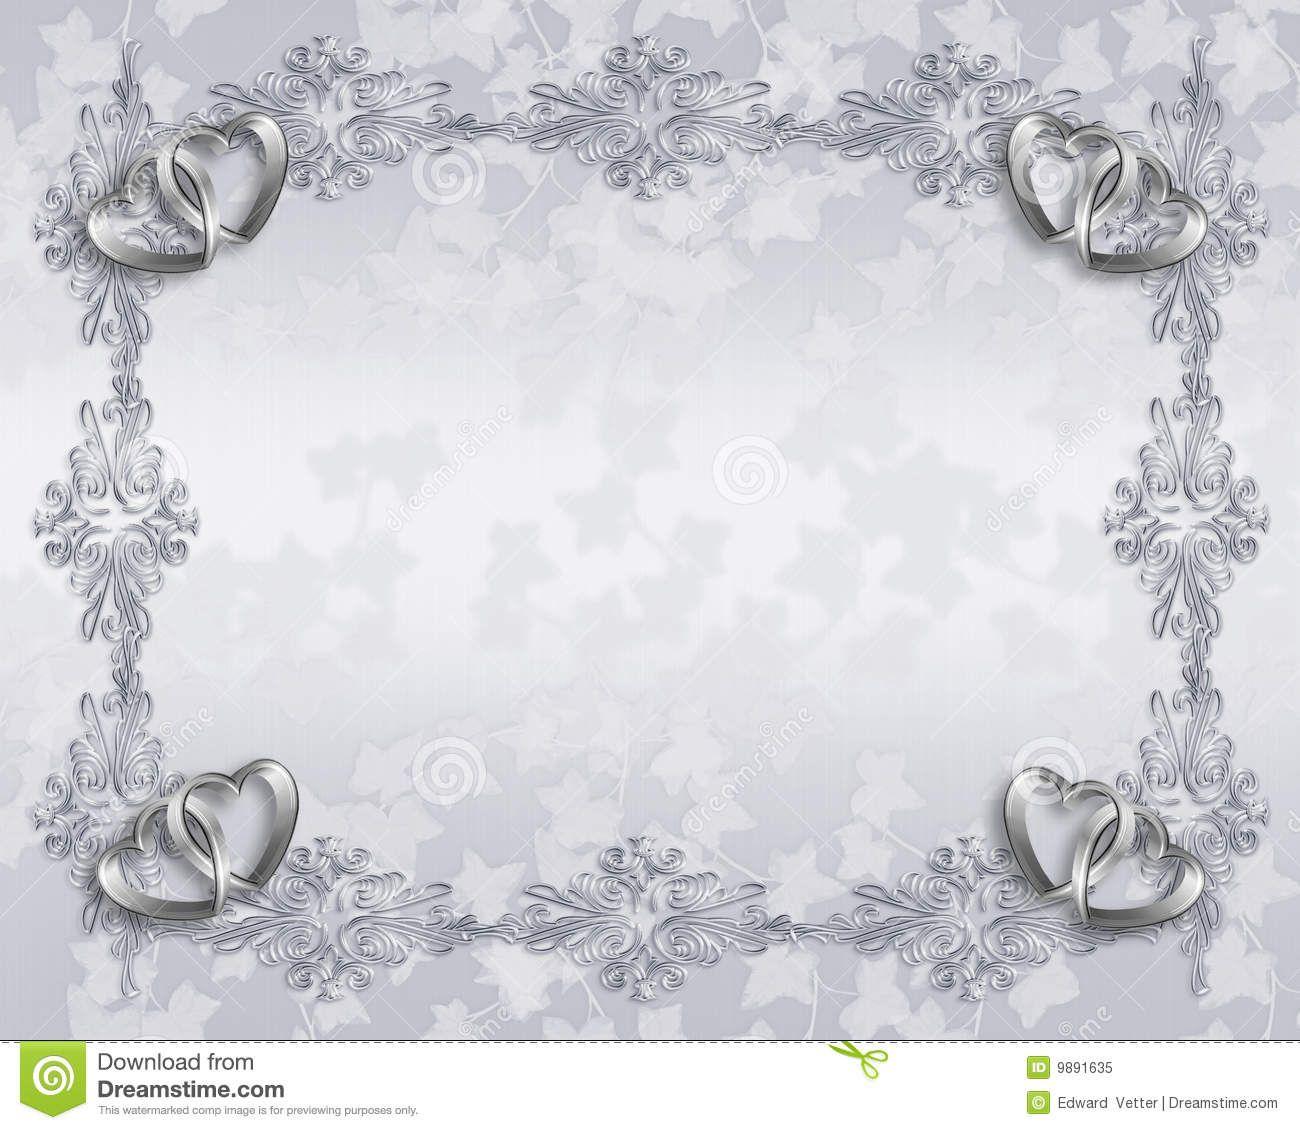 weddinginvitationelegantborder9891635.jpg (1300×1130